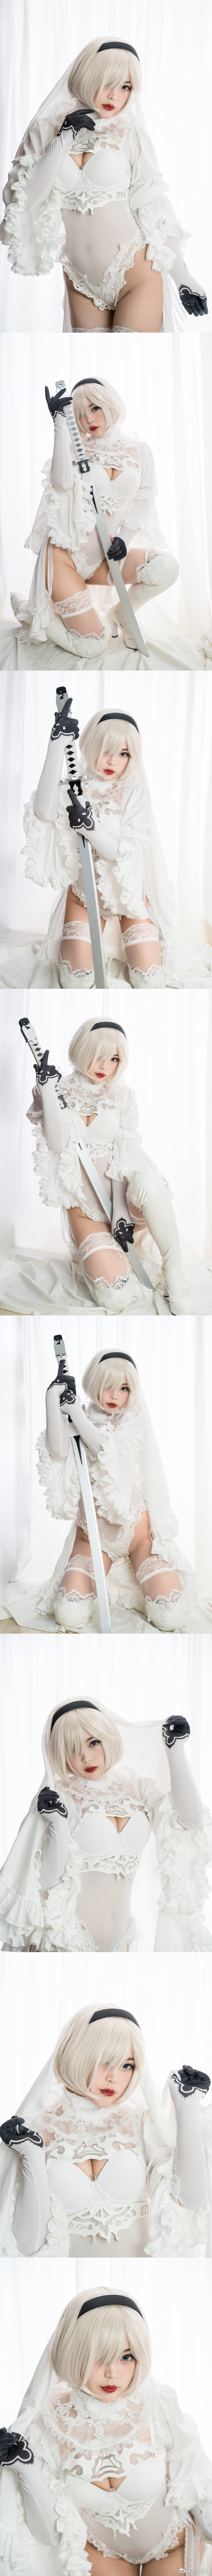 2B小姐姐的白色礼装Cosplay